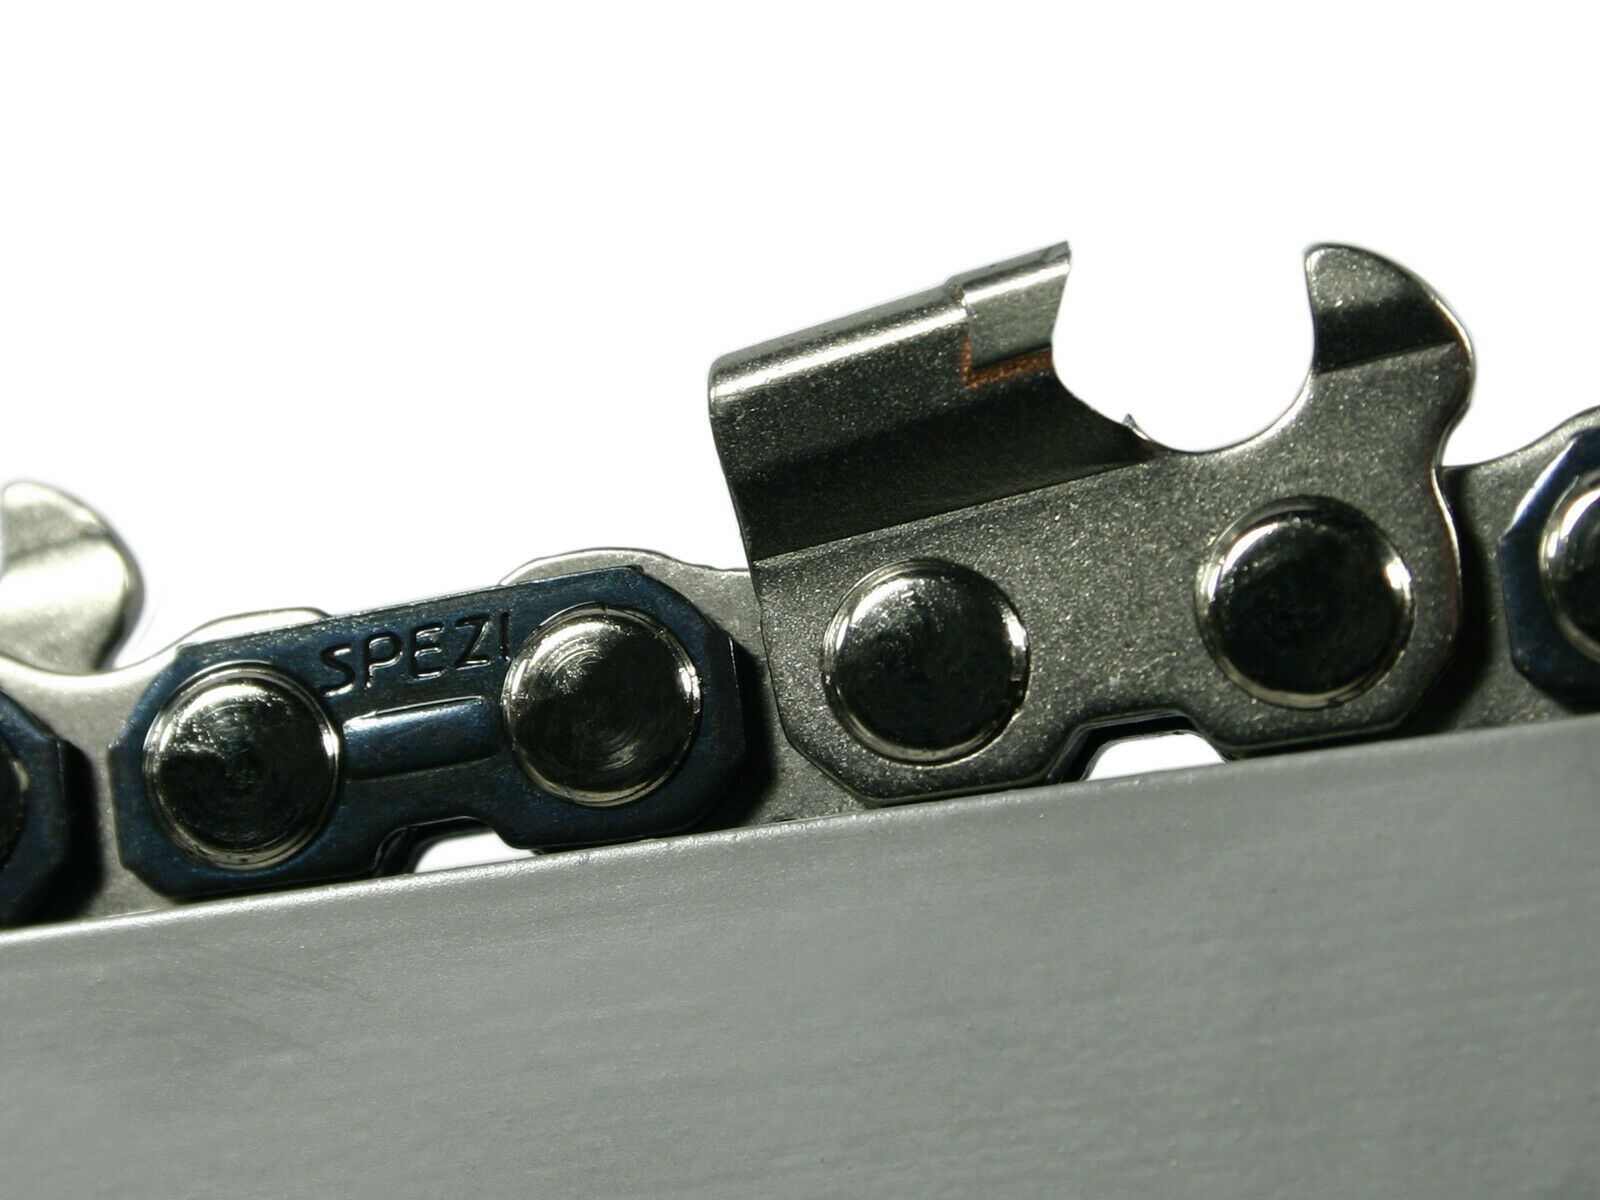 Metal duro cadena sierra adecuado para Husqvarna 238 43 cm 3 8  64 TG 1,5 mm Cochebide